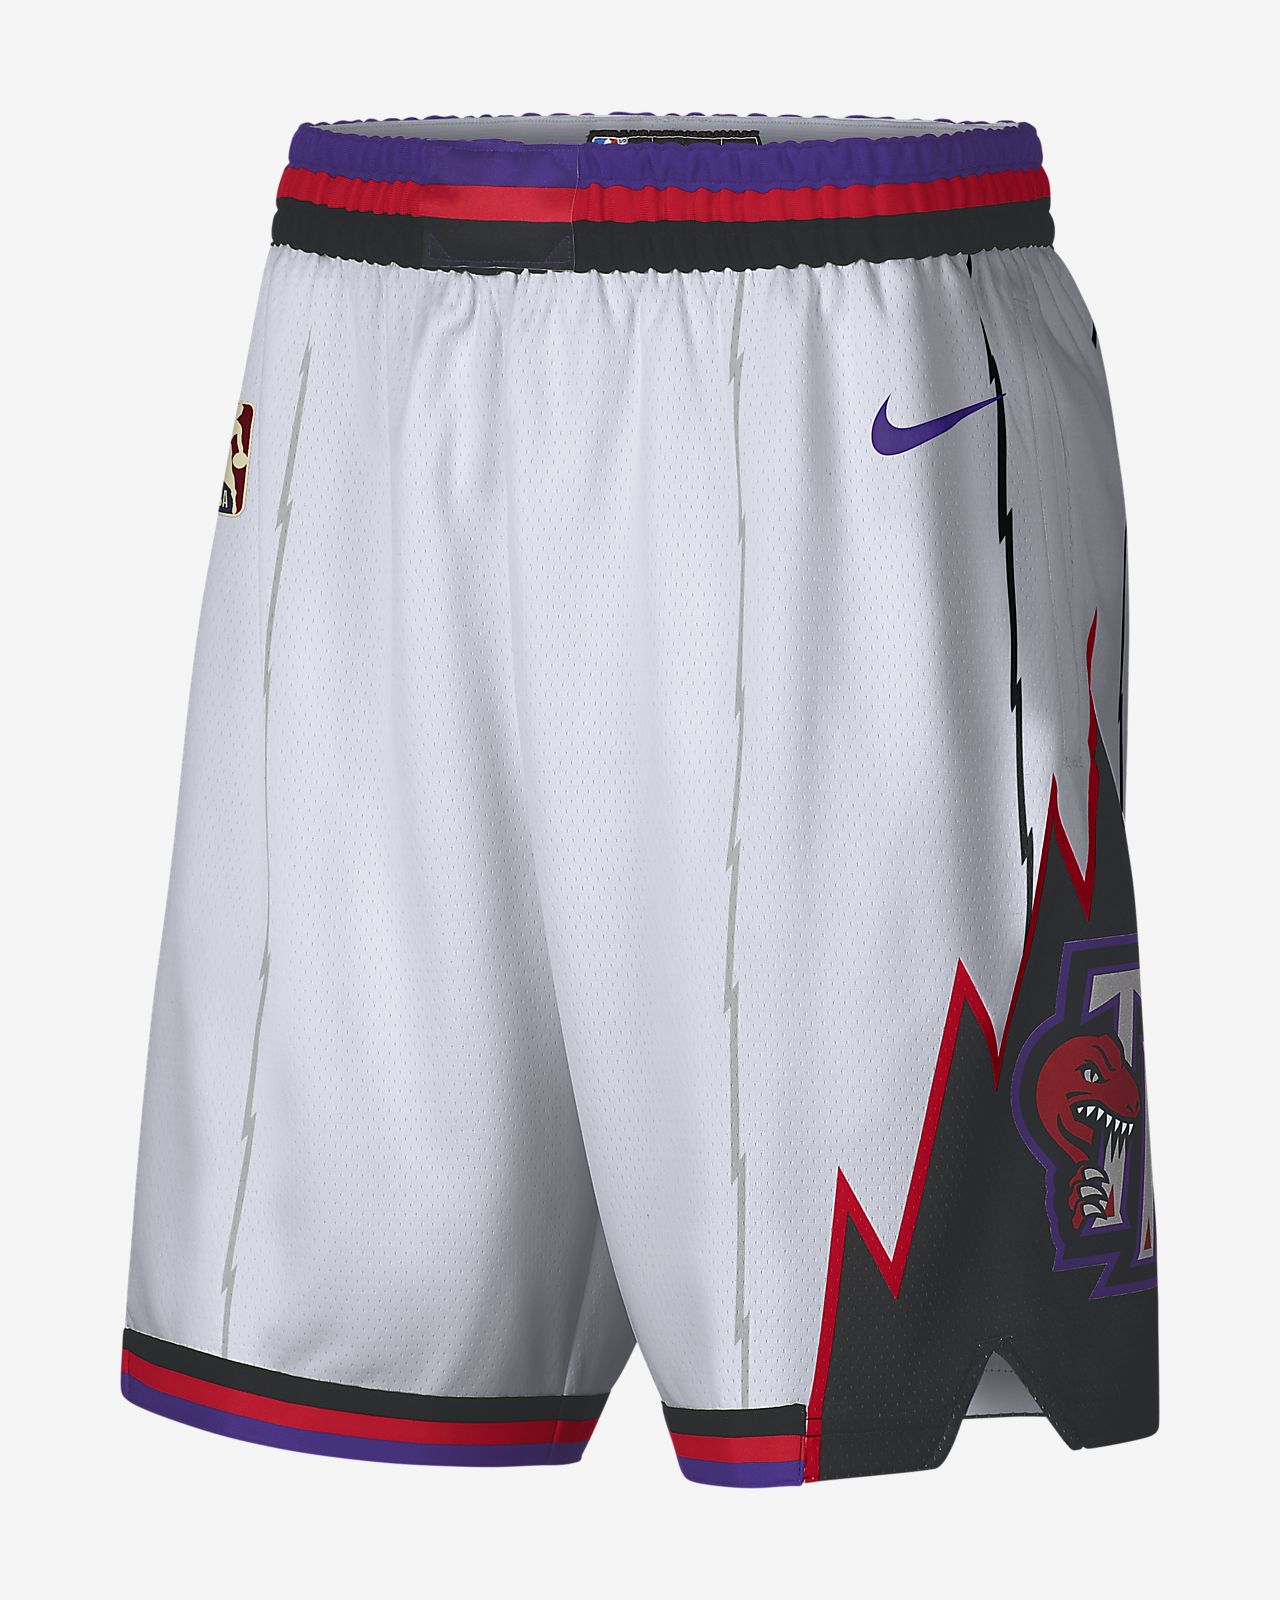 Short Nike NBA Toronto Raptors Classic Edition Swingman pour Homme